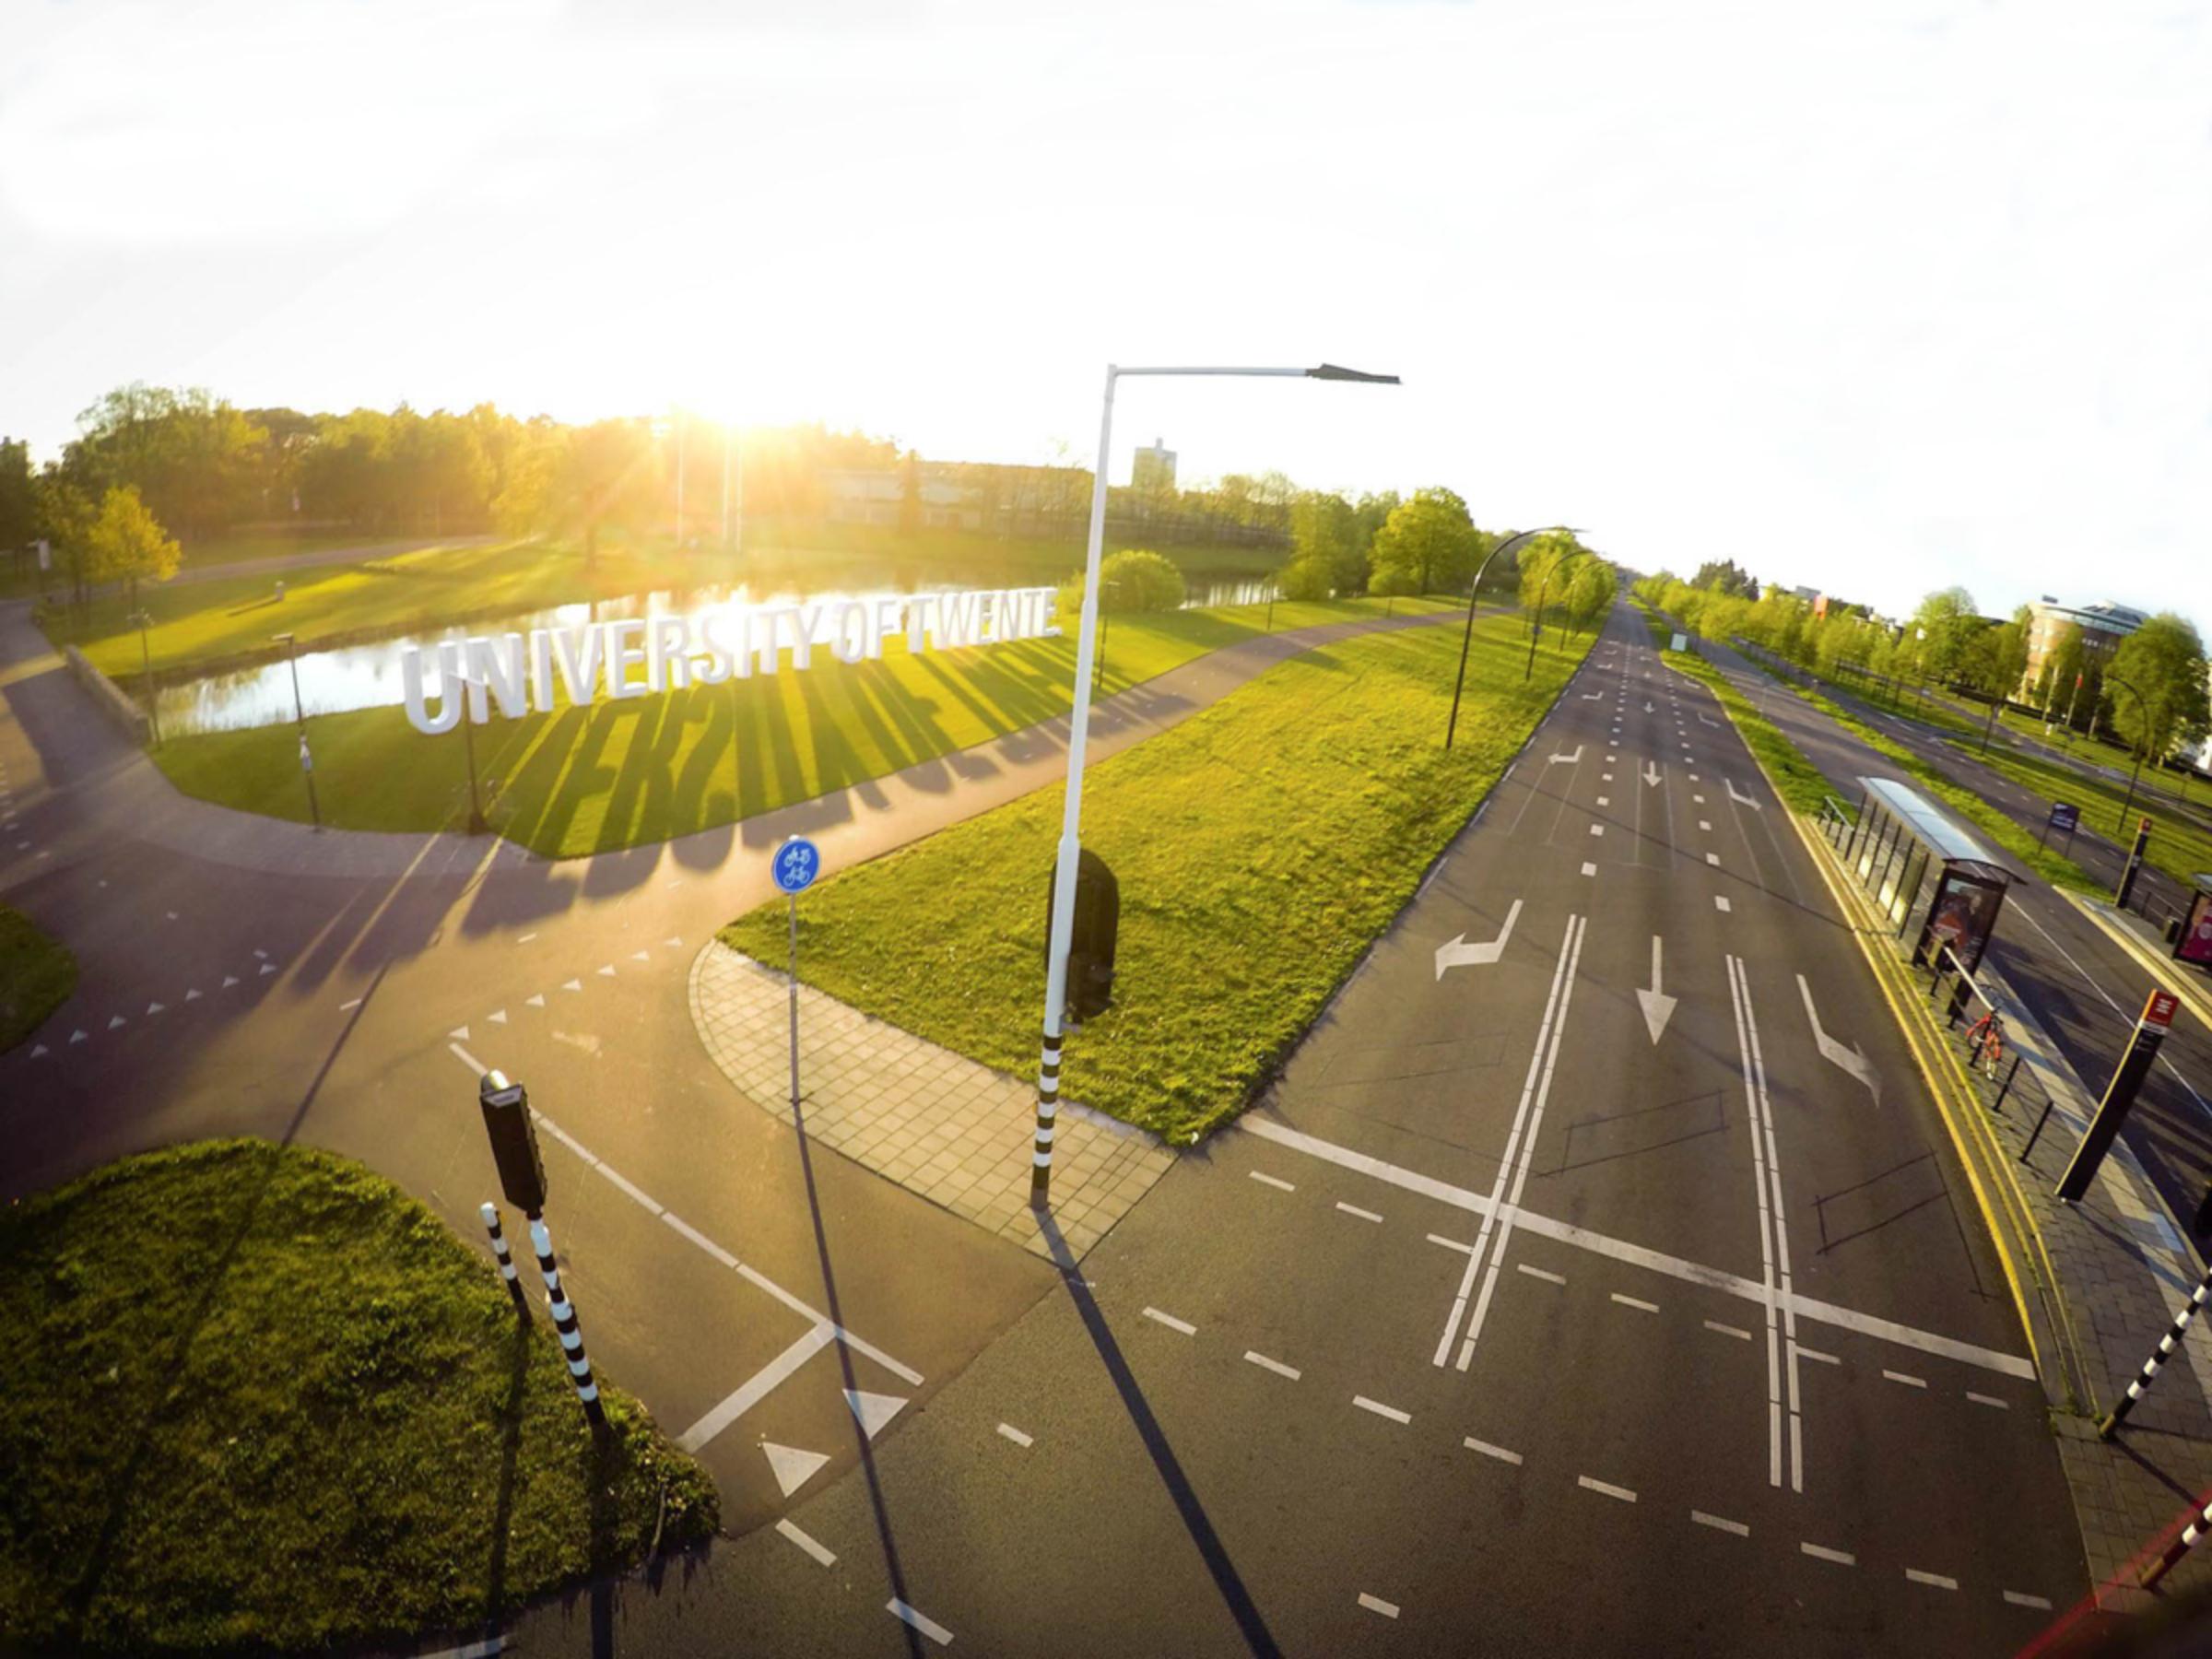 University of Twente2 verkleind